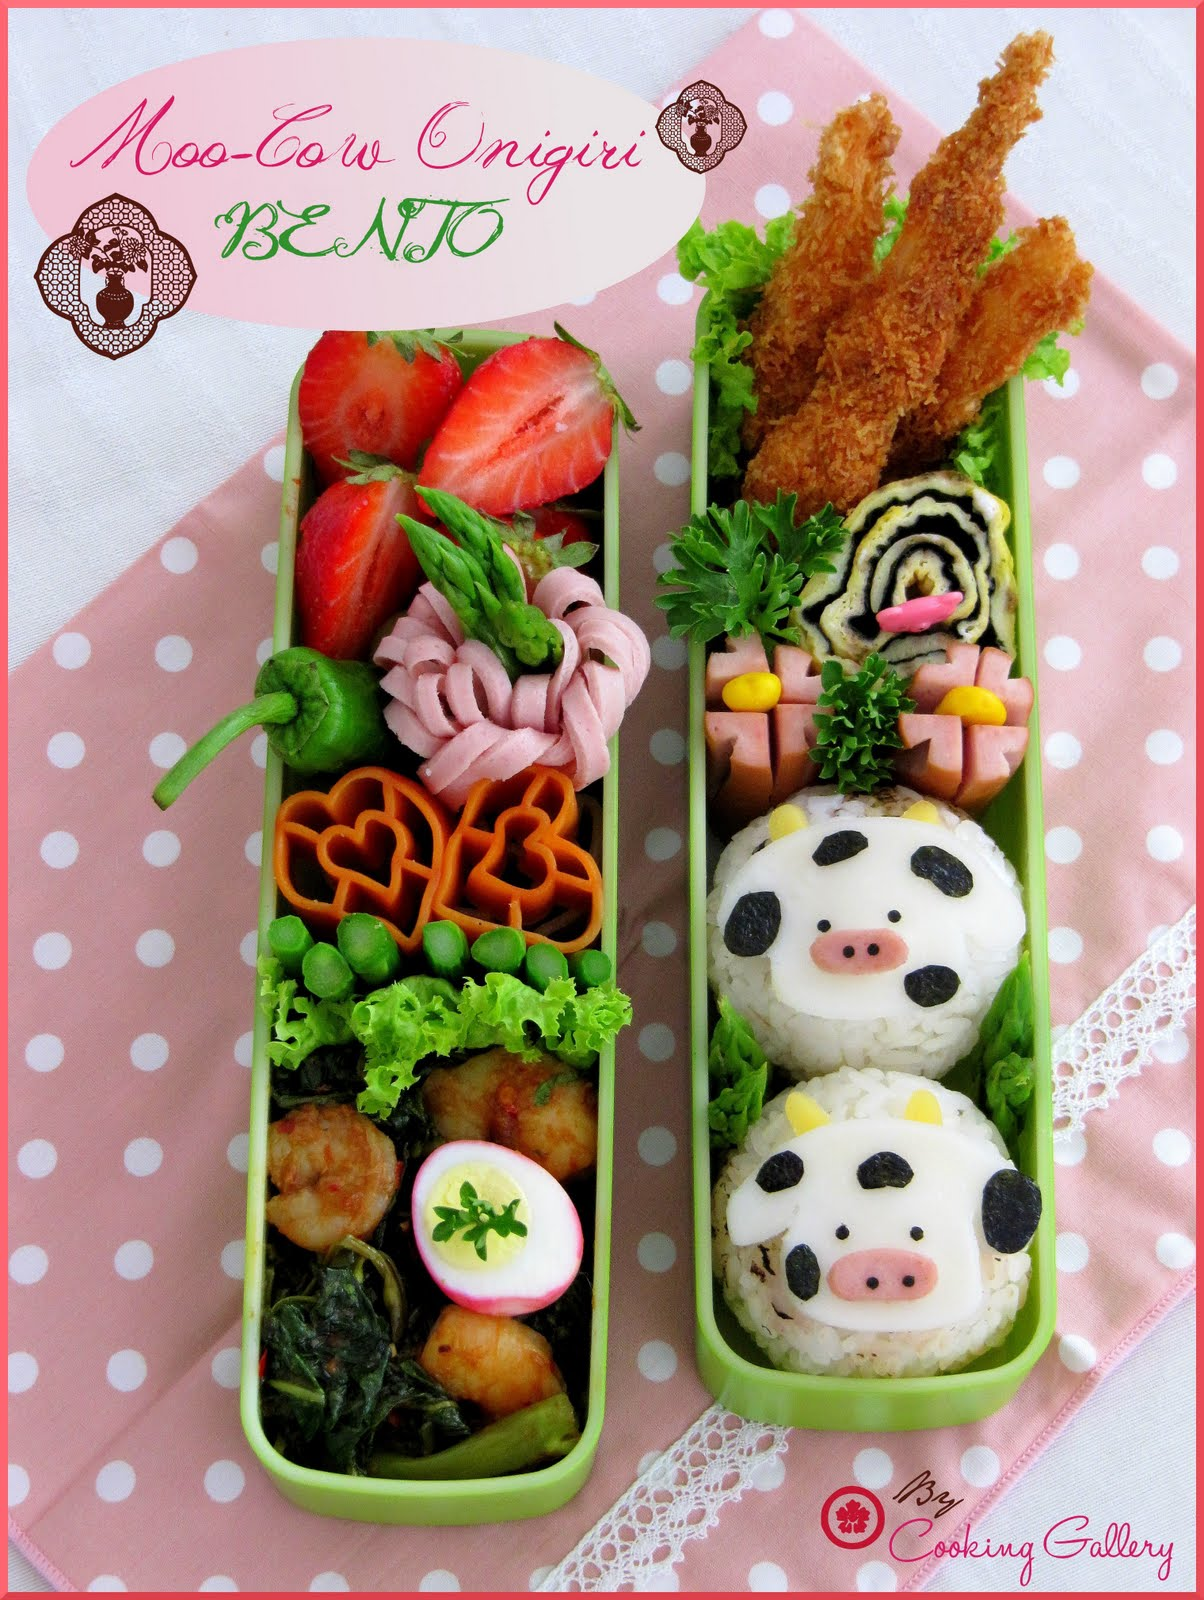 Onigiri Bento Moo-Cow Onigiri...